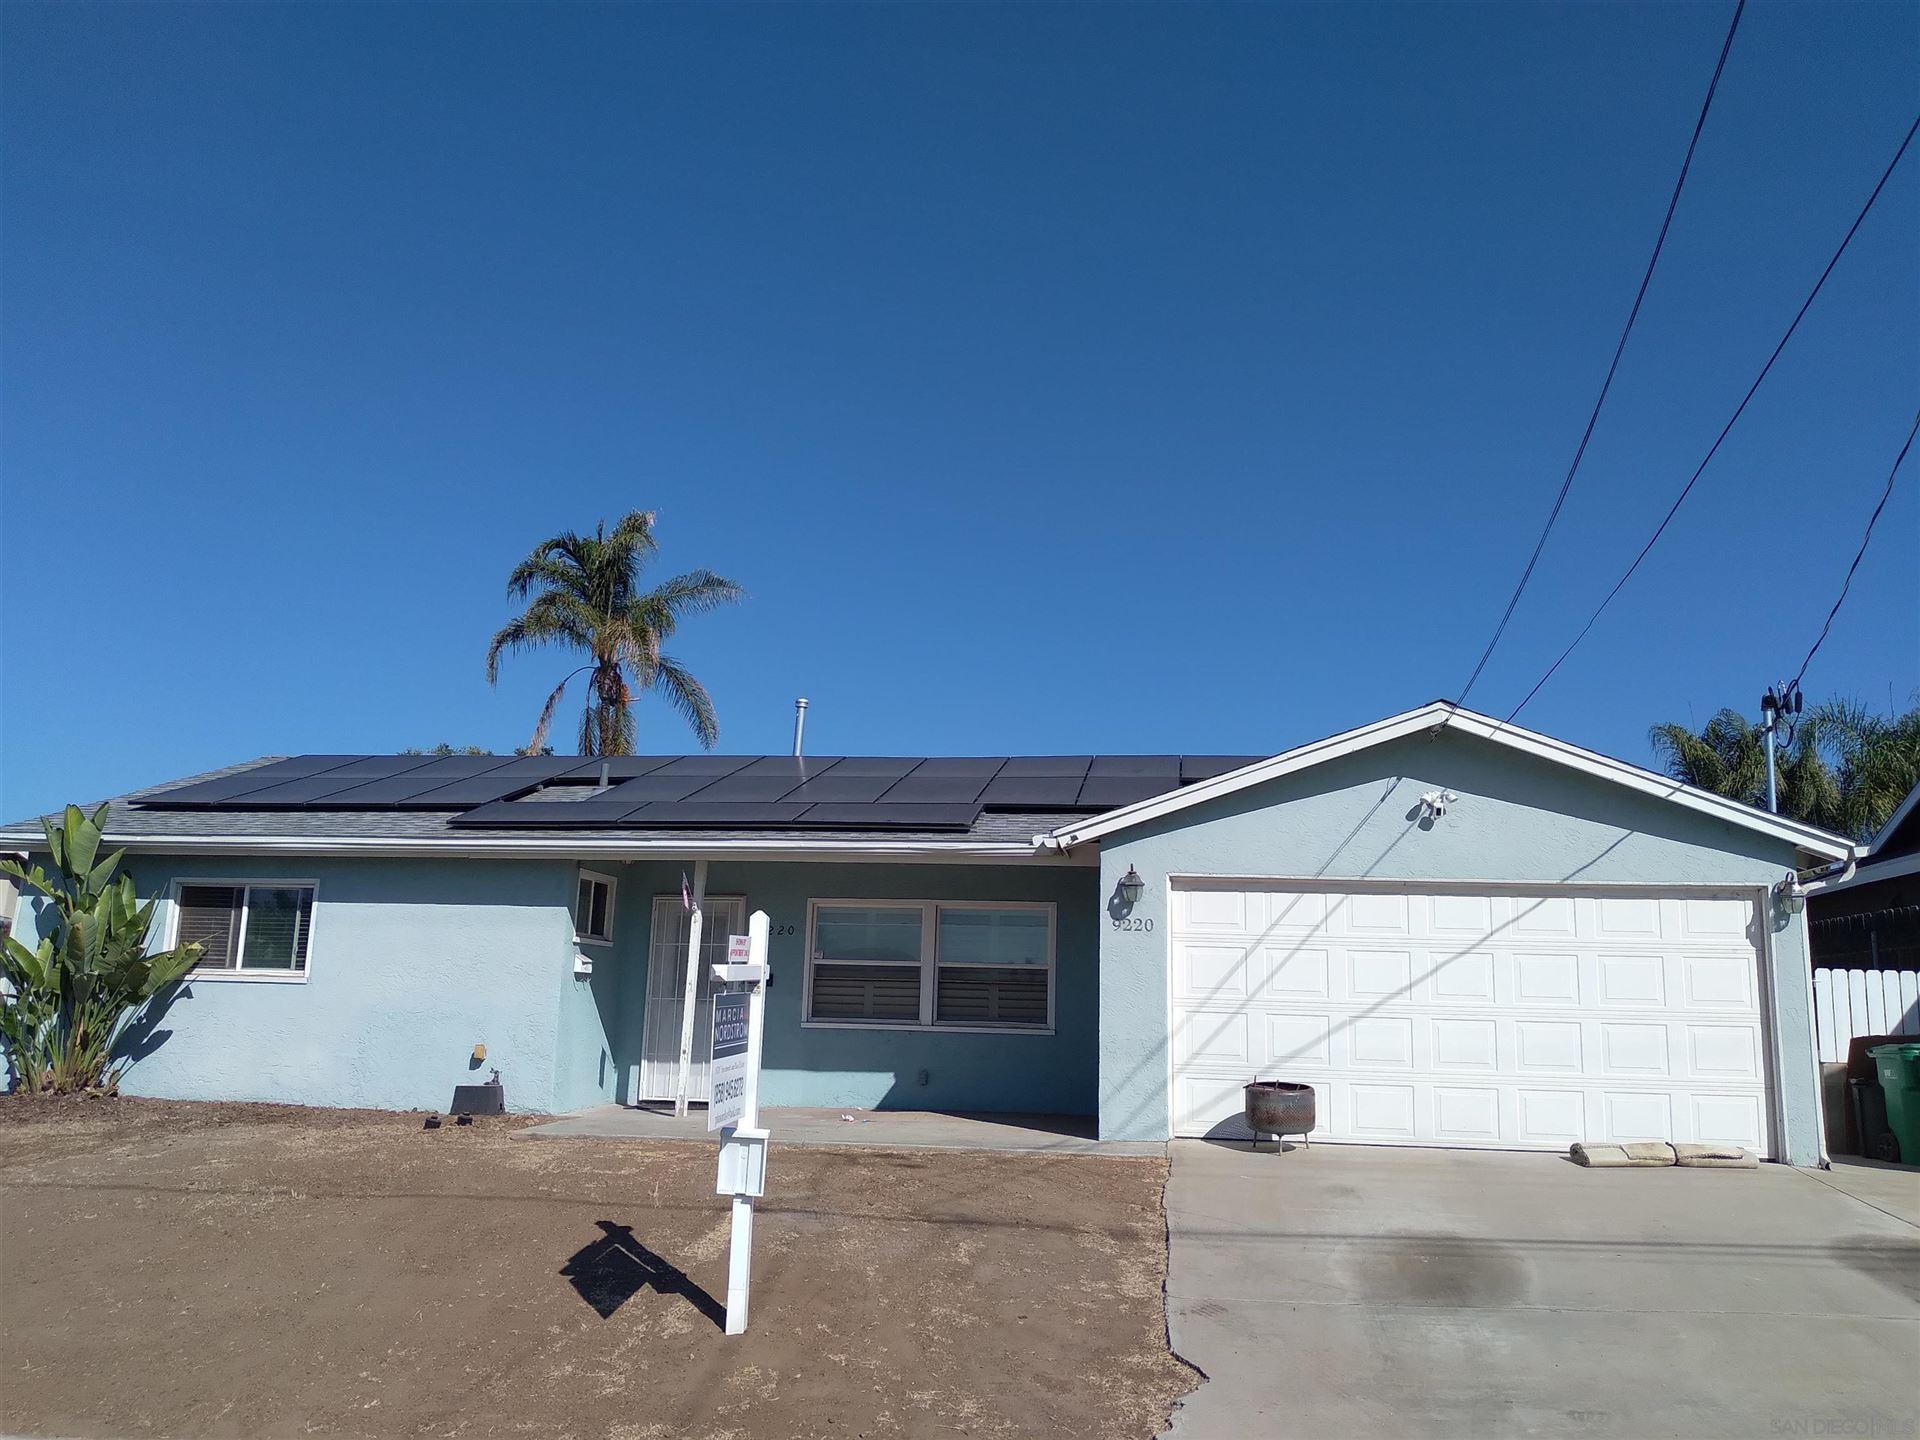 Photo of 9220 Bellagio Rd, Santee, CA 92071 (MLS # 210025376)